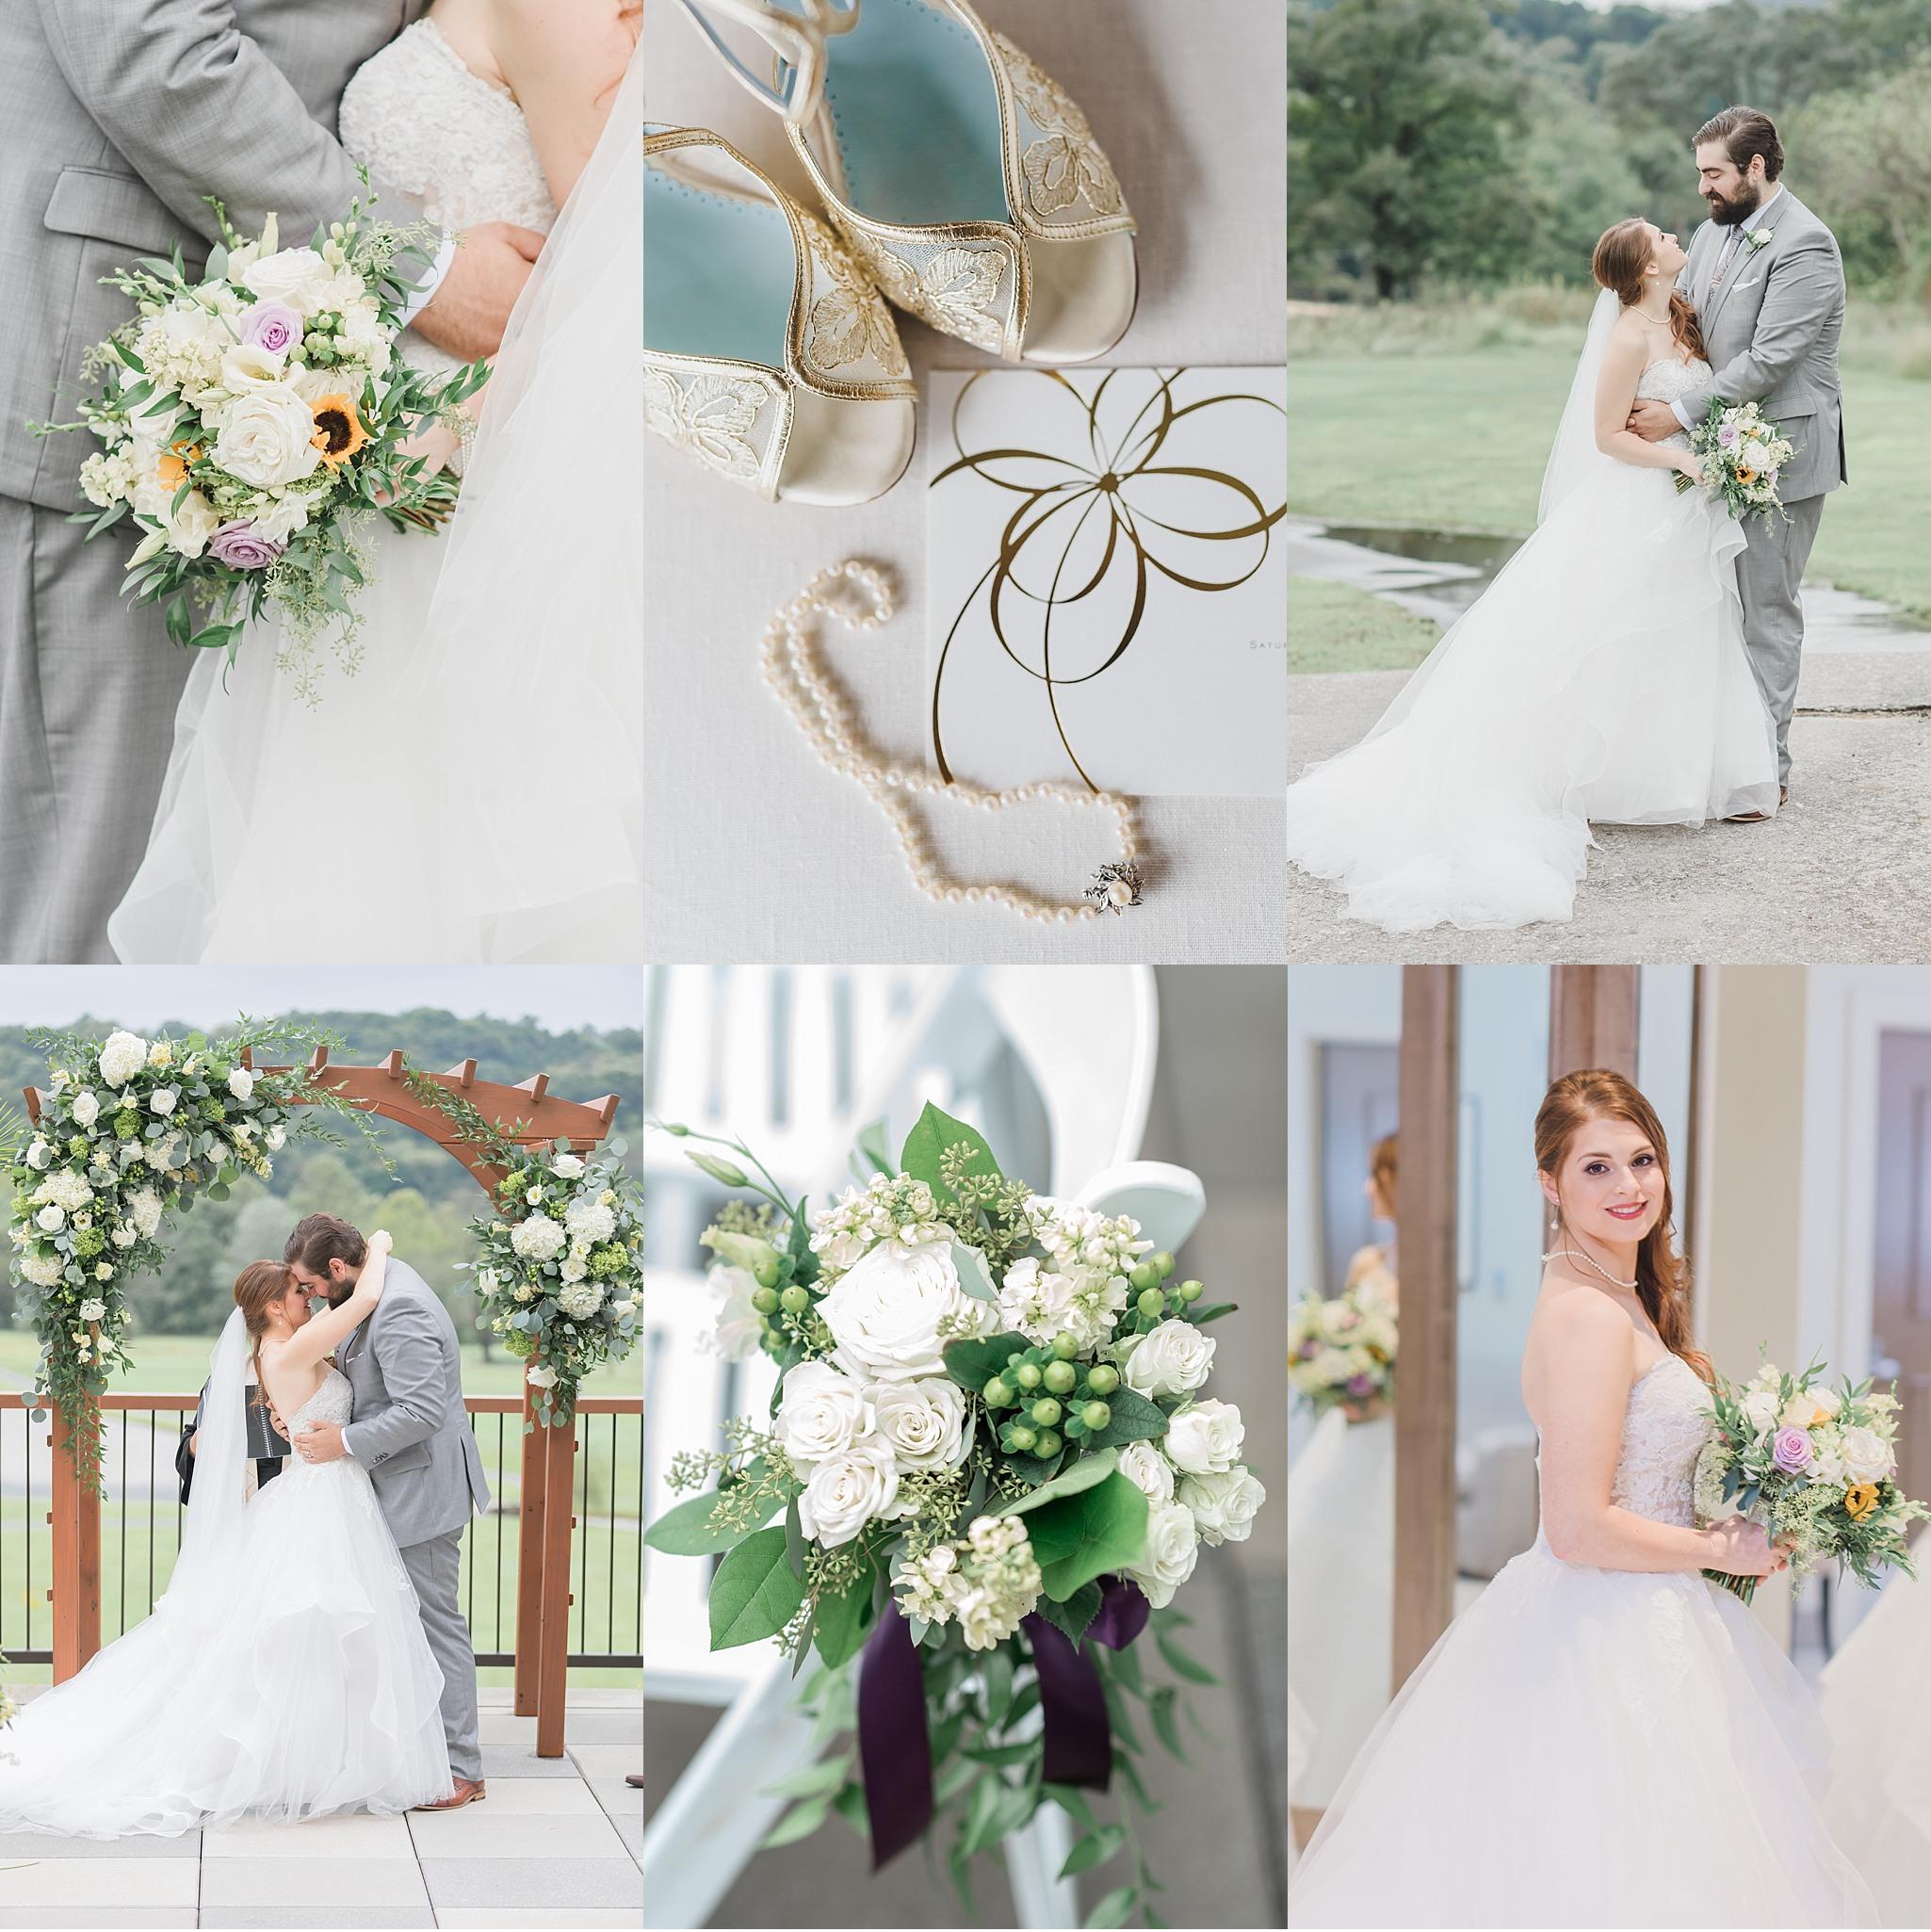 Elegant Ski Liberty Resort Fairfiled PA wedding photography photo_2099.jpg